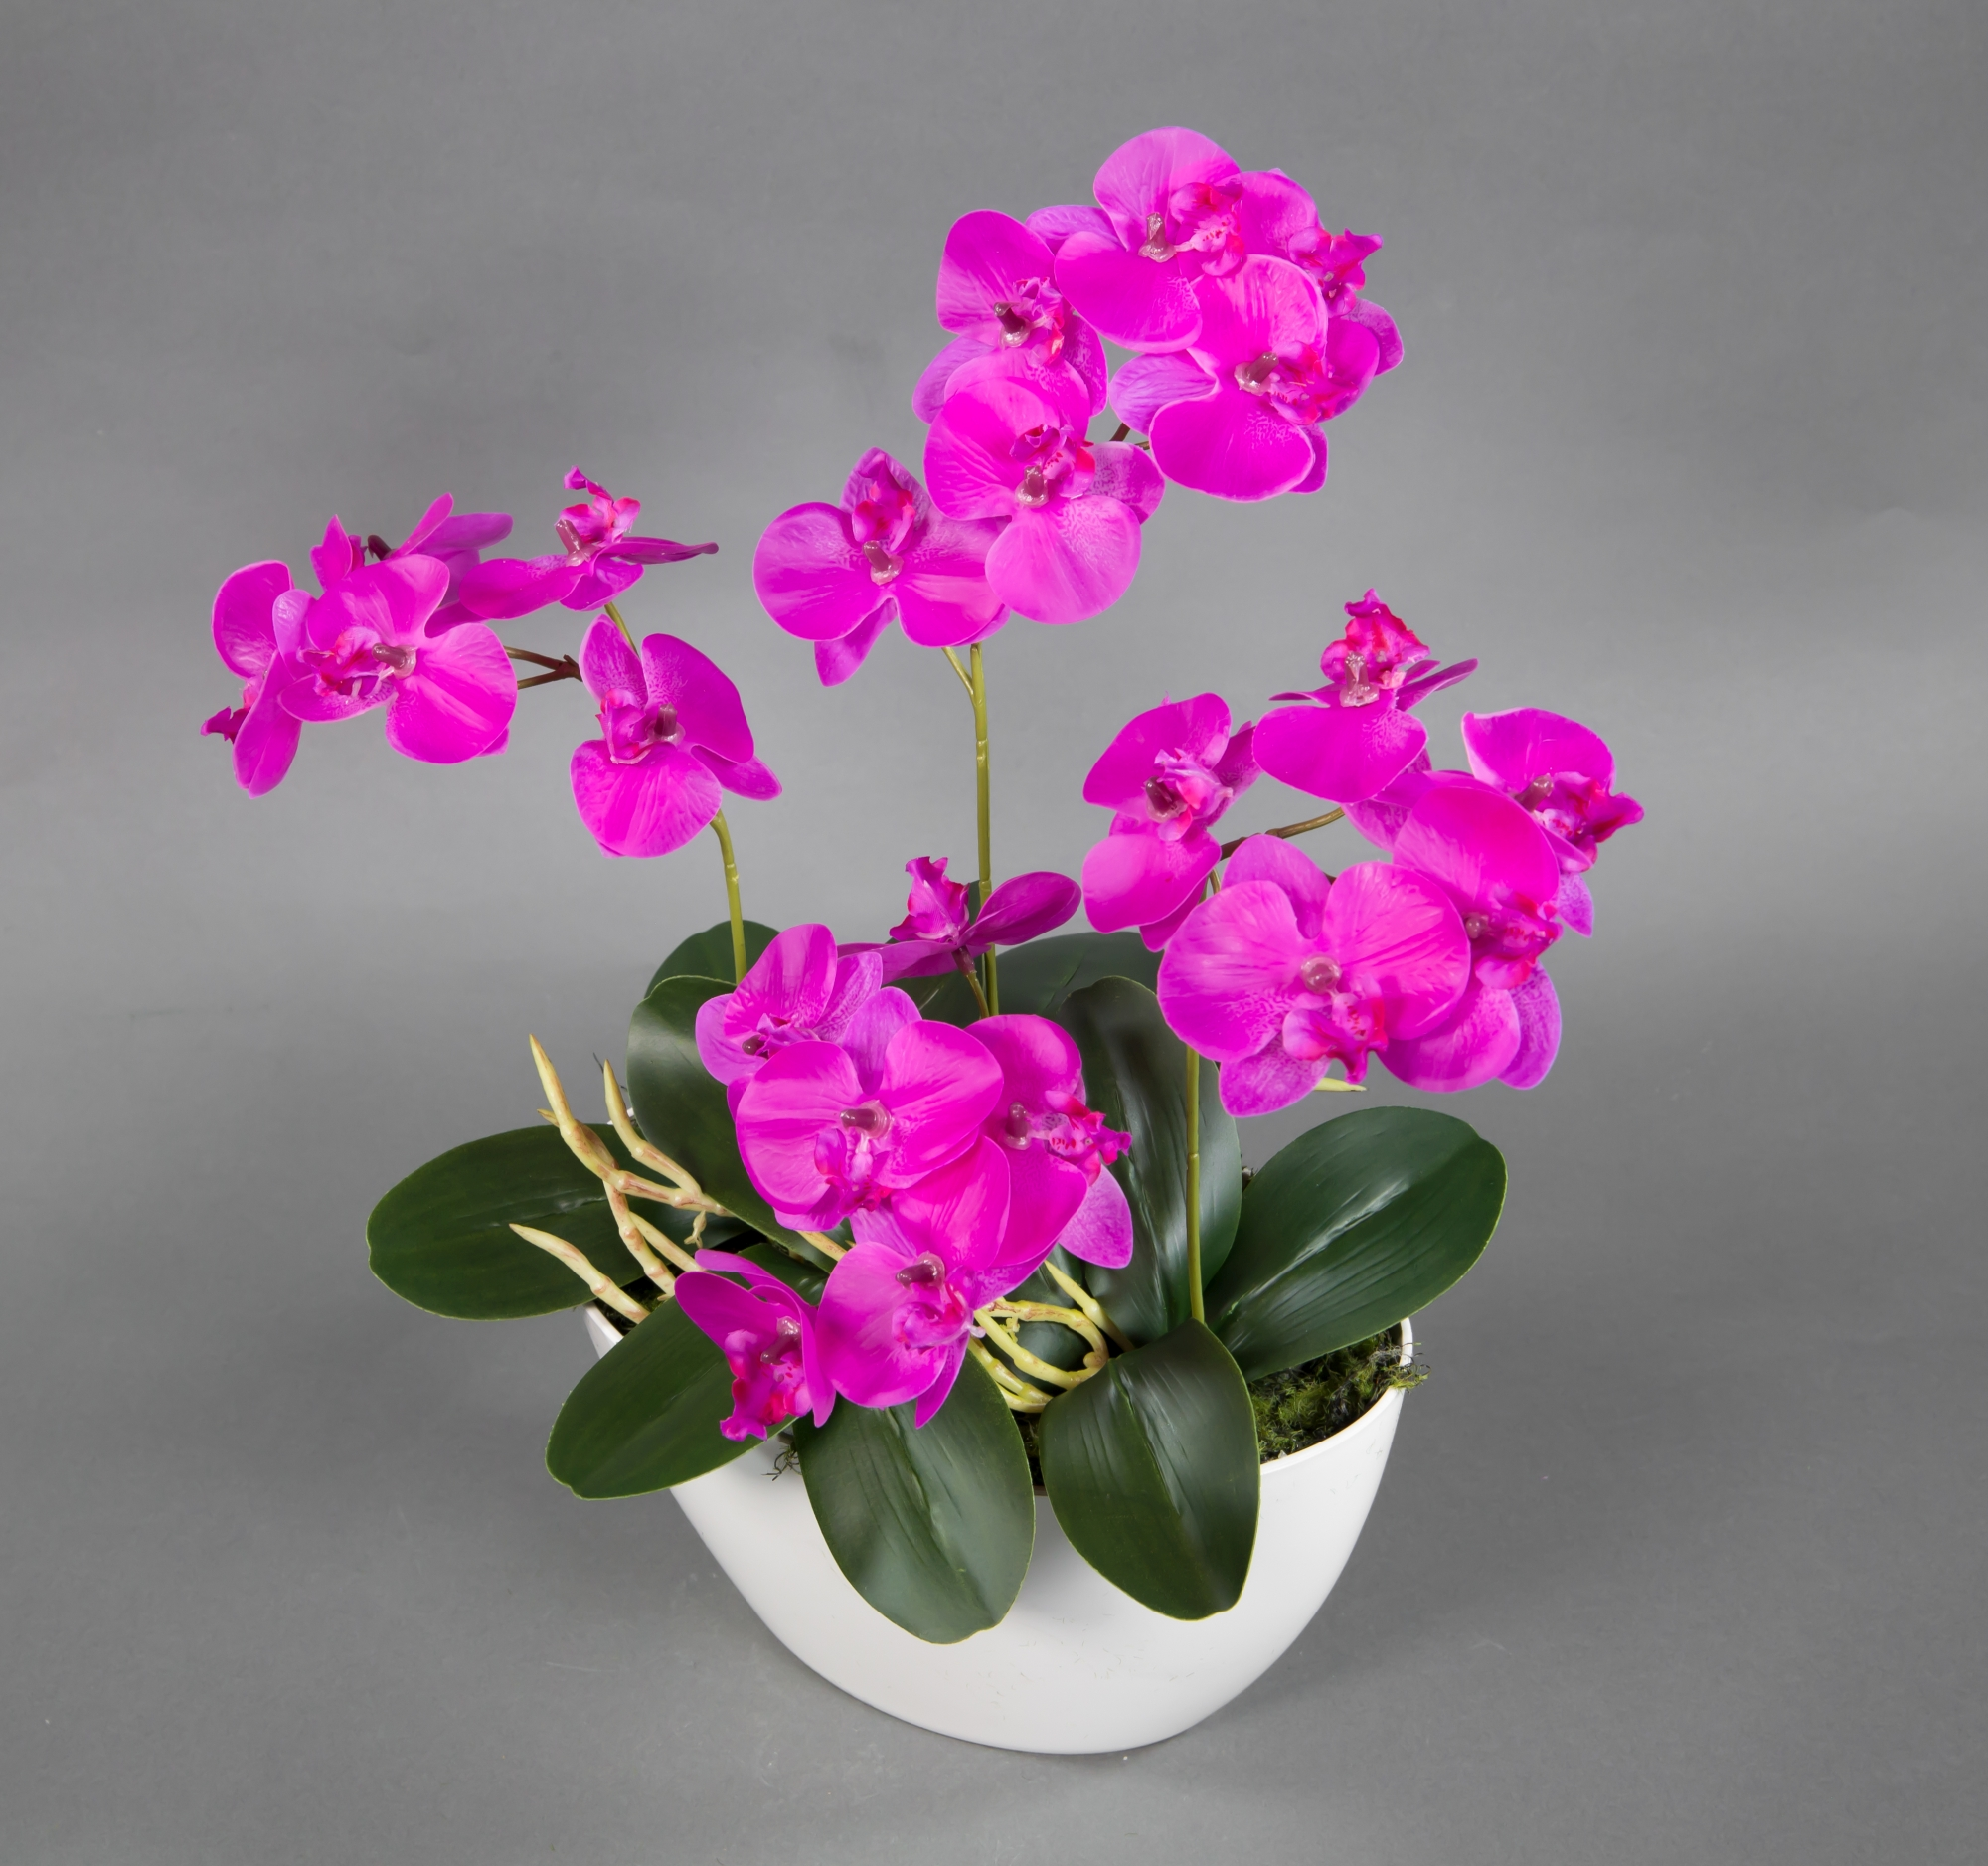 Orchideen arrangements orchideen kunstblumen seidenblumen seidenblumen ro gmbh - Orchideen arrangement ...